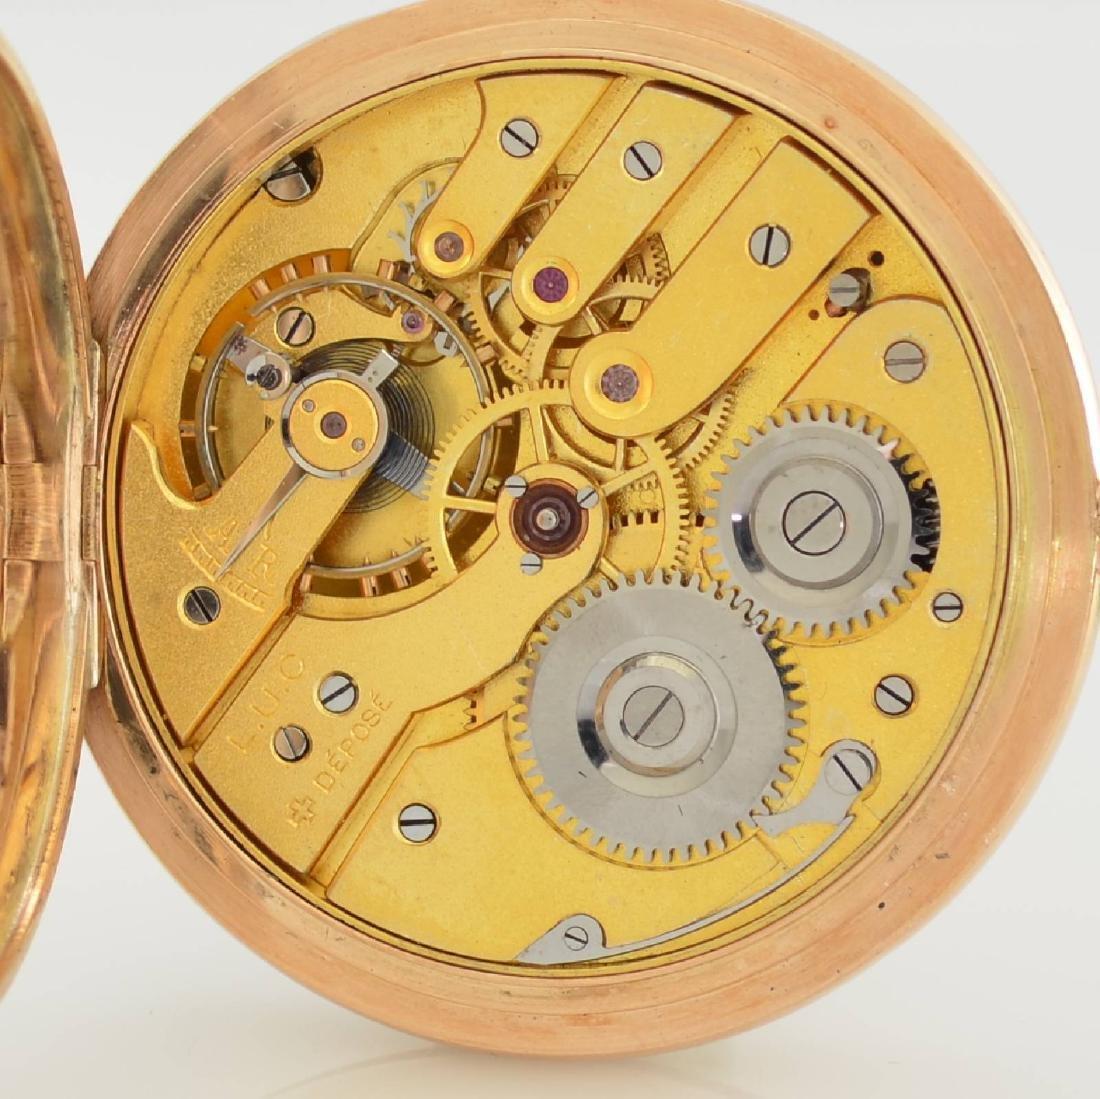 L.U.C. Chopard 14k pink gold pocket watch - 9